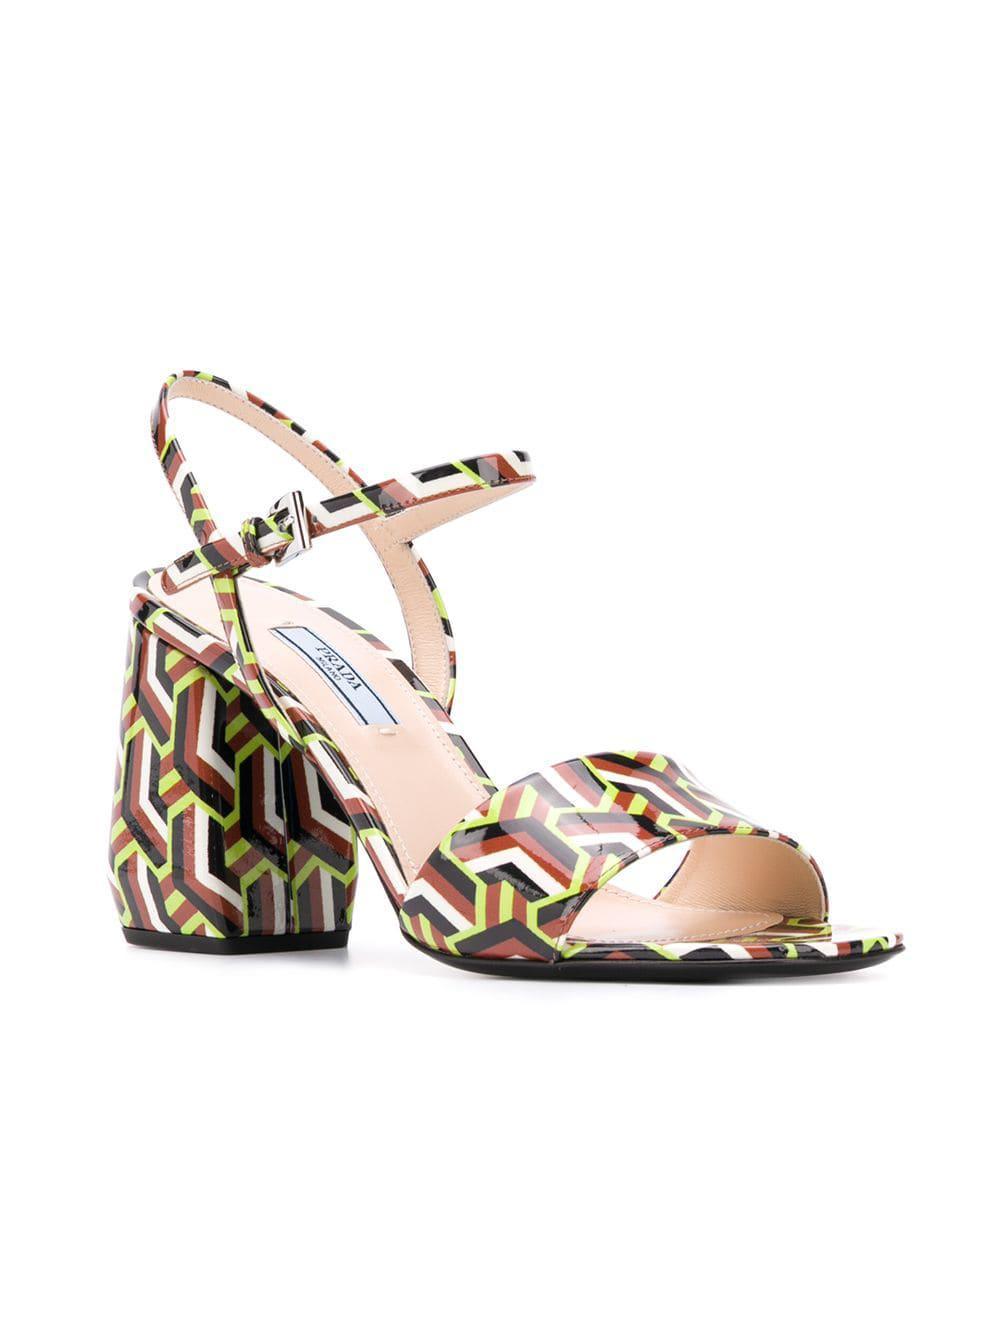 5da09f4ef8bd Lyst - Prada Printed Sandals in Brown - Save 19%